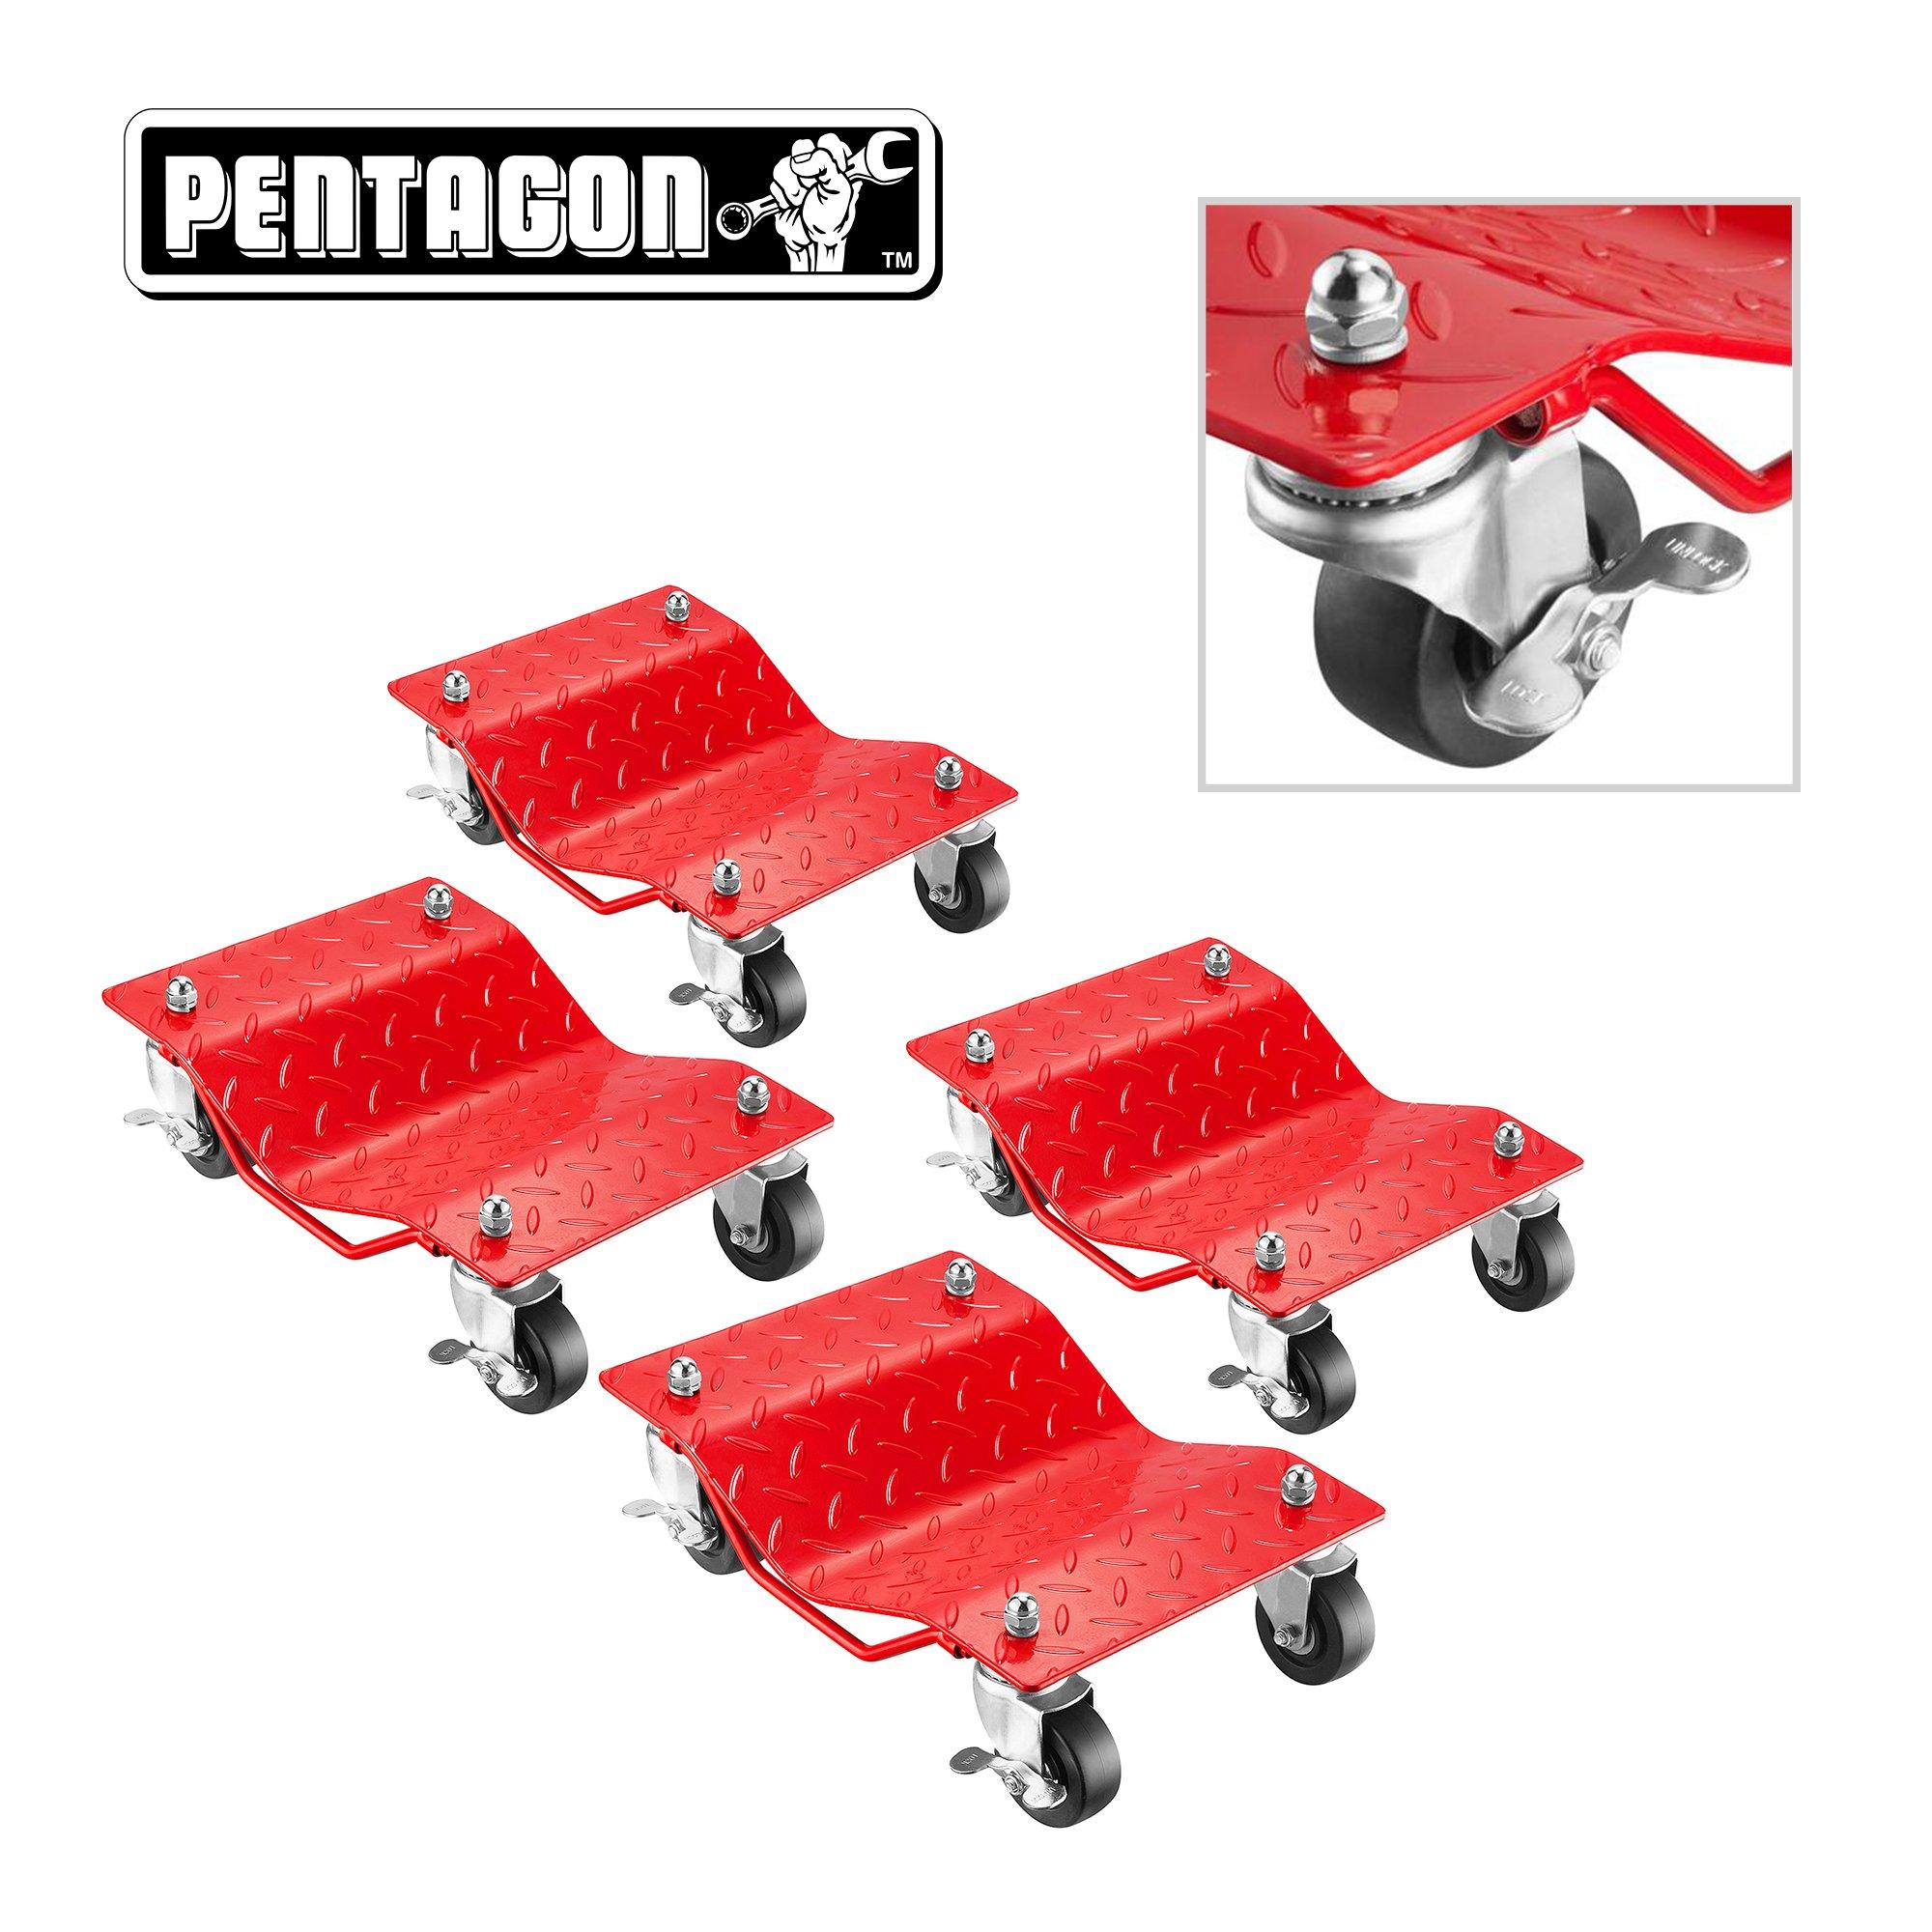 5051 Pentagon Tool   Premium 4-Pack   Car Tire Dolly - Tire Skates by Pentagon